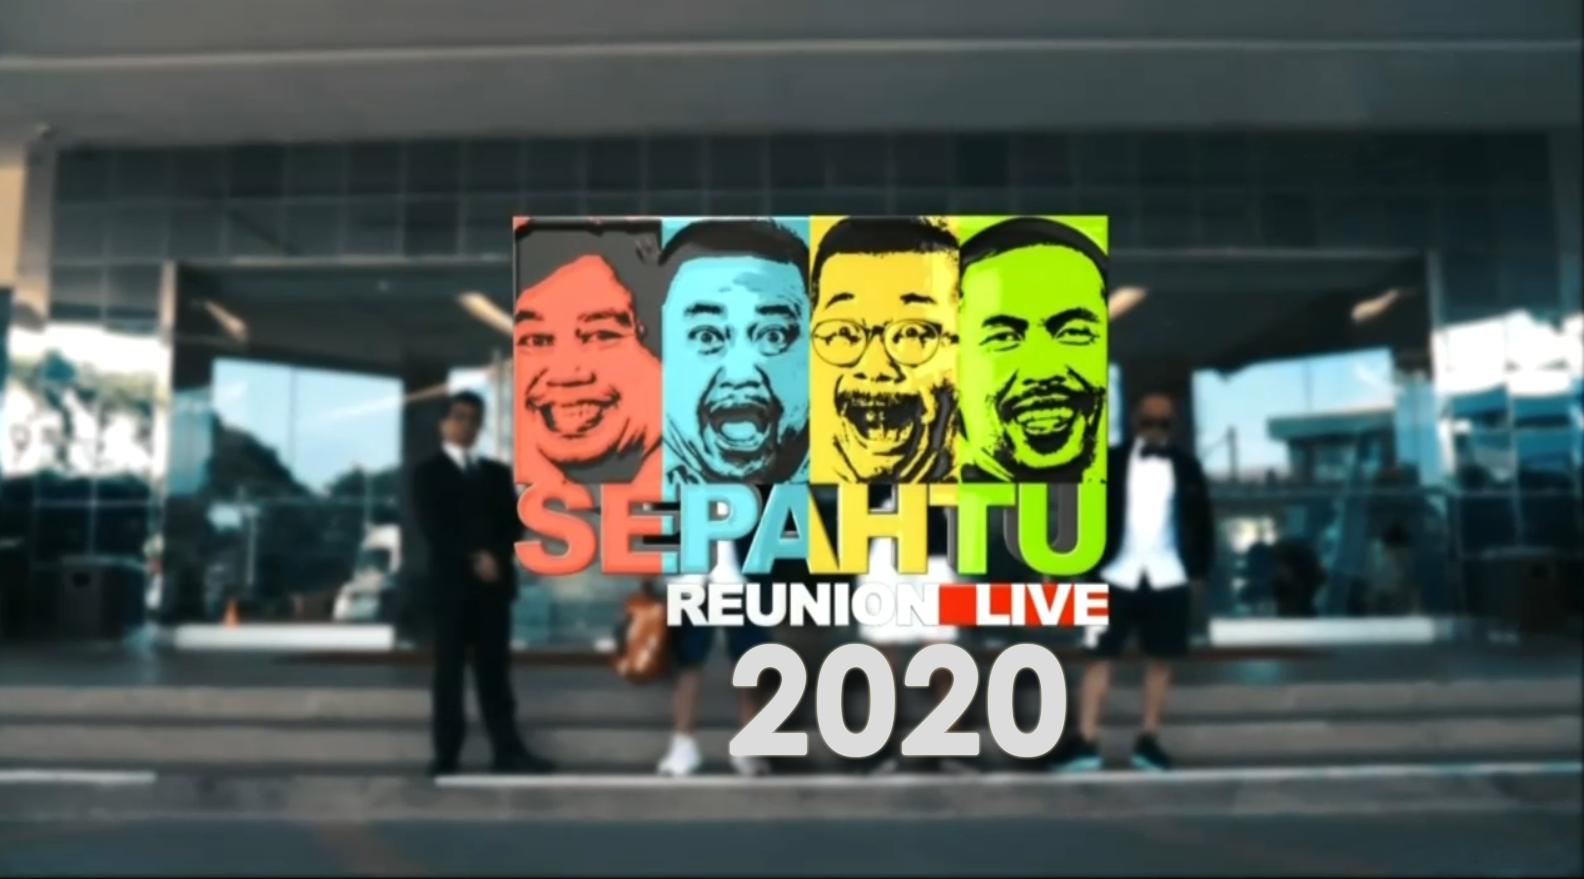 Sepahtu Reunion Live (2020)